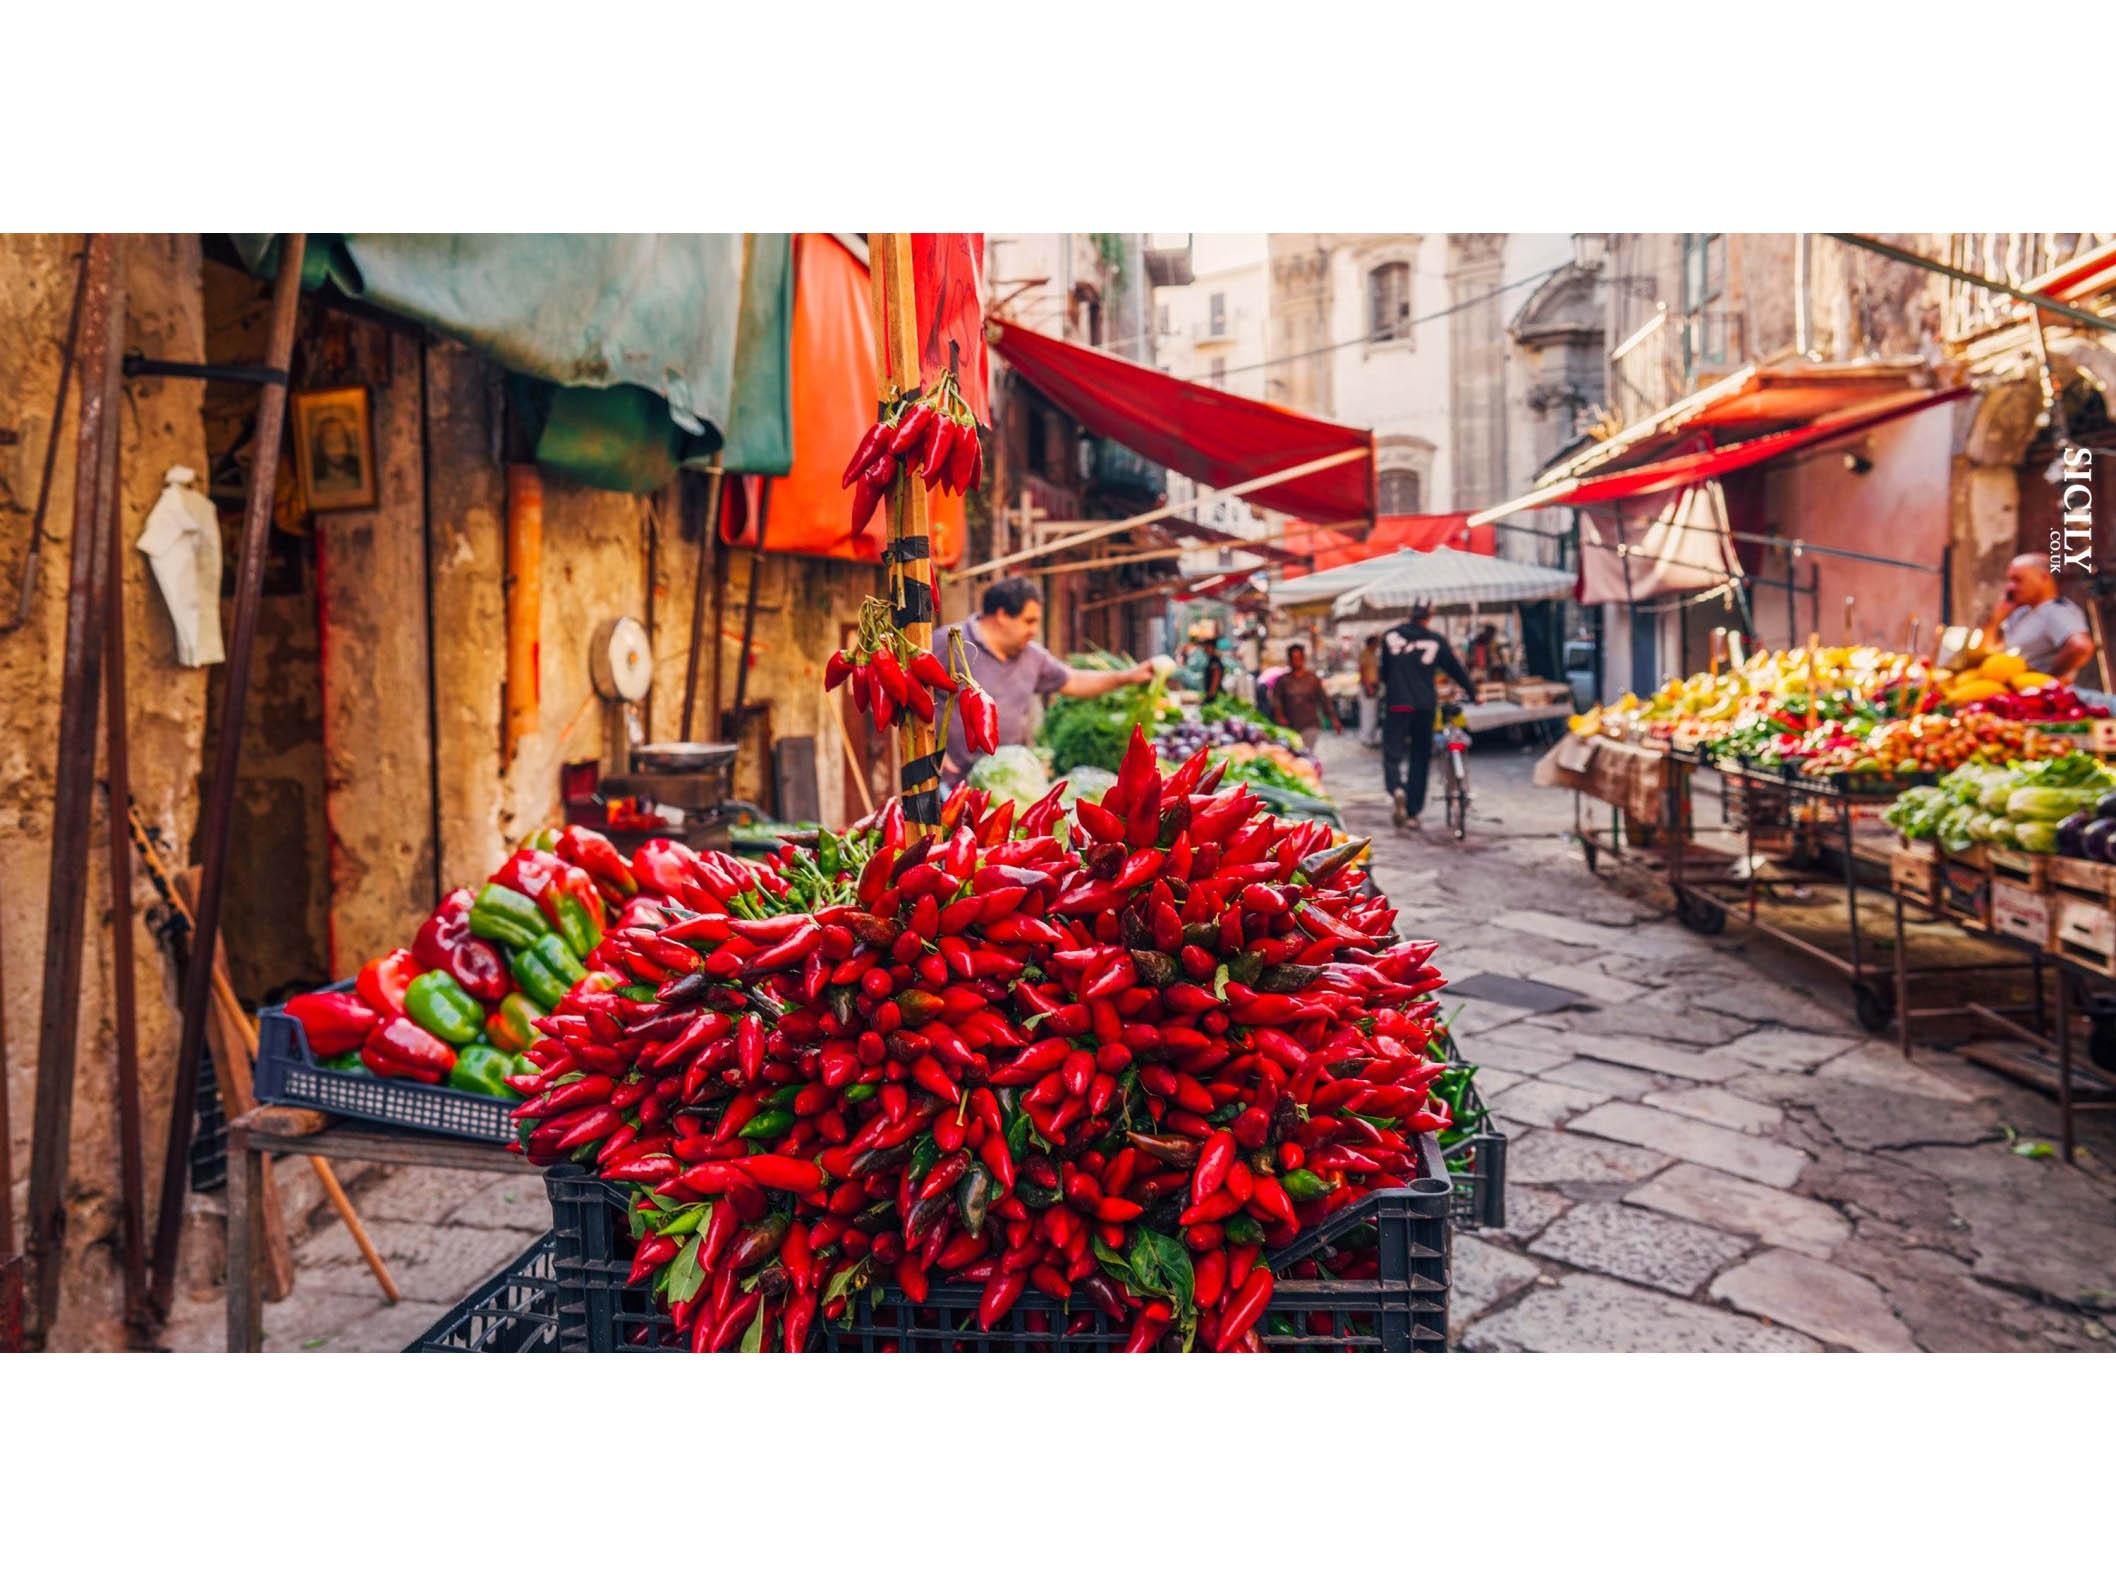 food-and-wine-palermo-street-markets-2116×1120.jpg